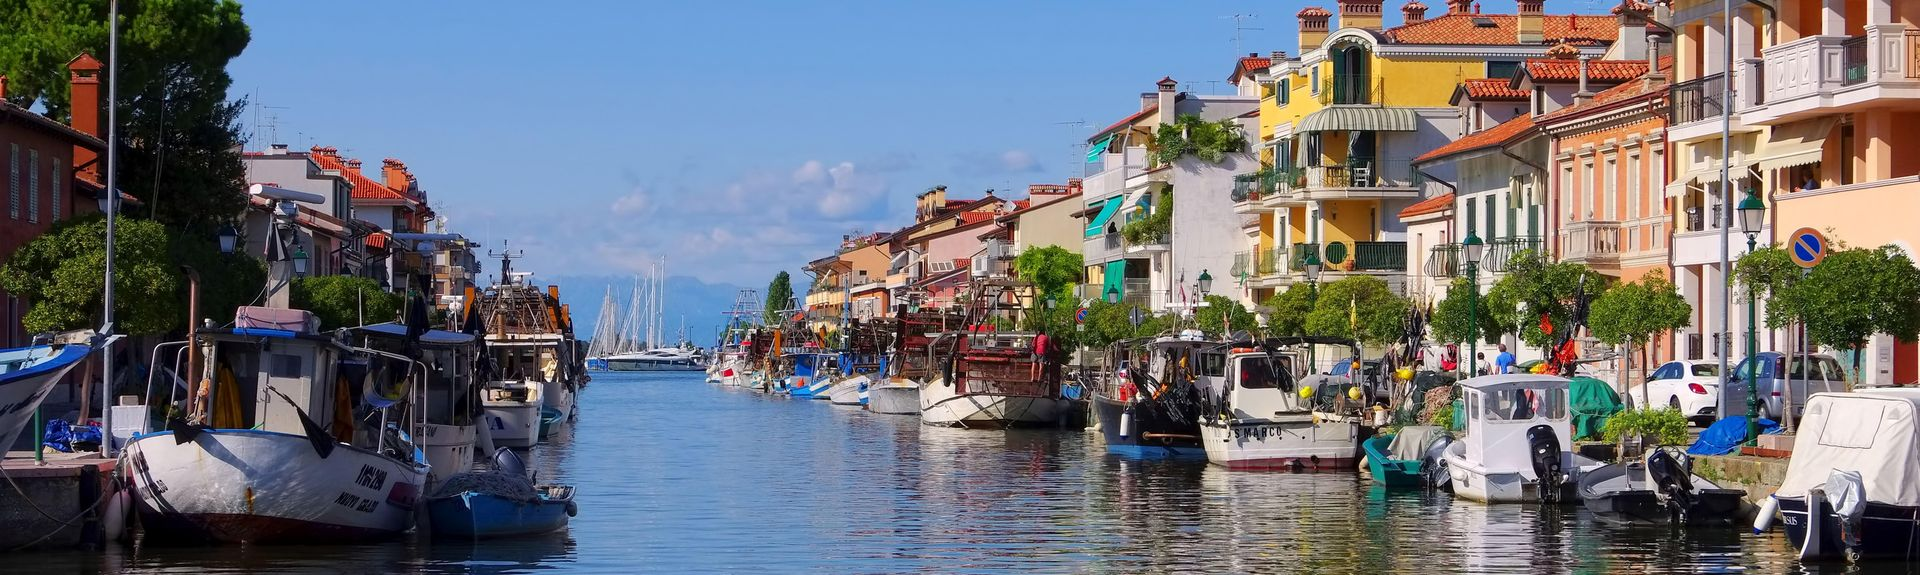 Grado, Friaul-Julisch Venetien, Italien